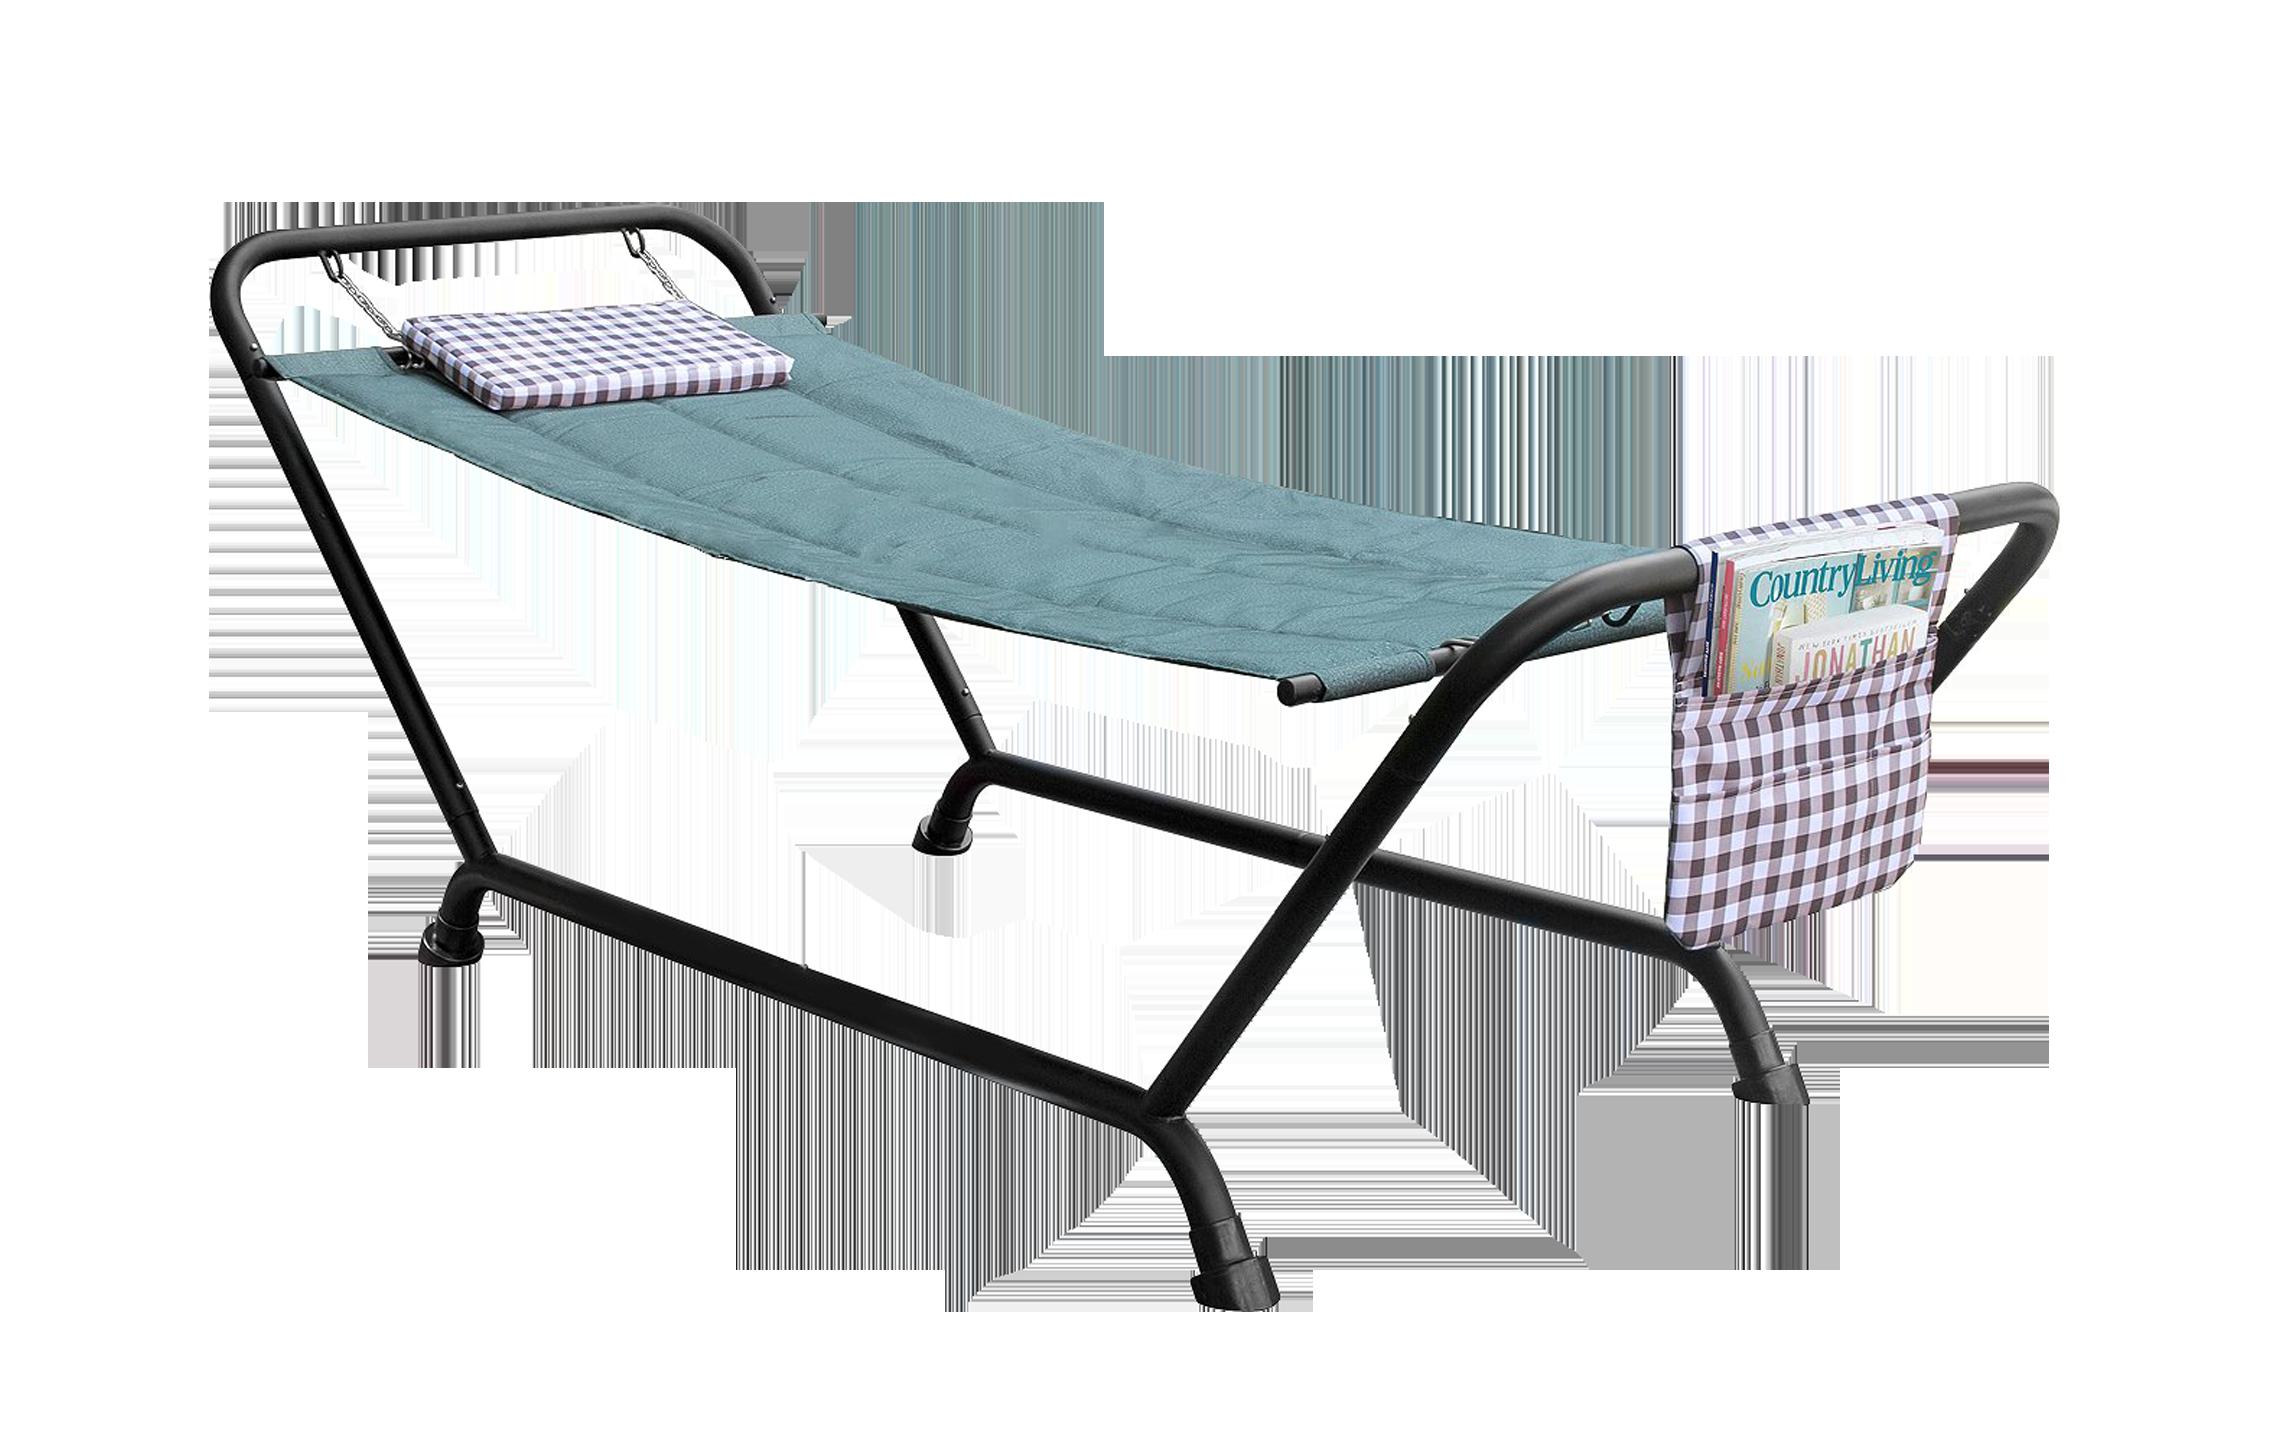 Best Portable Folding Hammocks - Sorbus | Hammock bed, Folding hammock,  Hammock stand